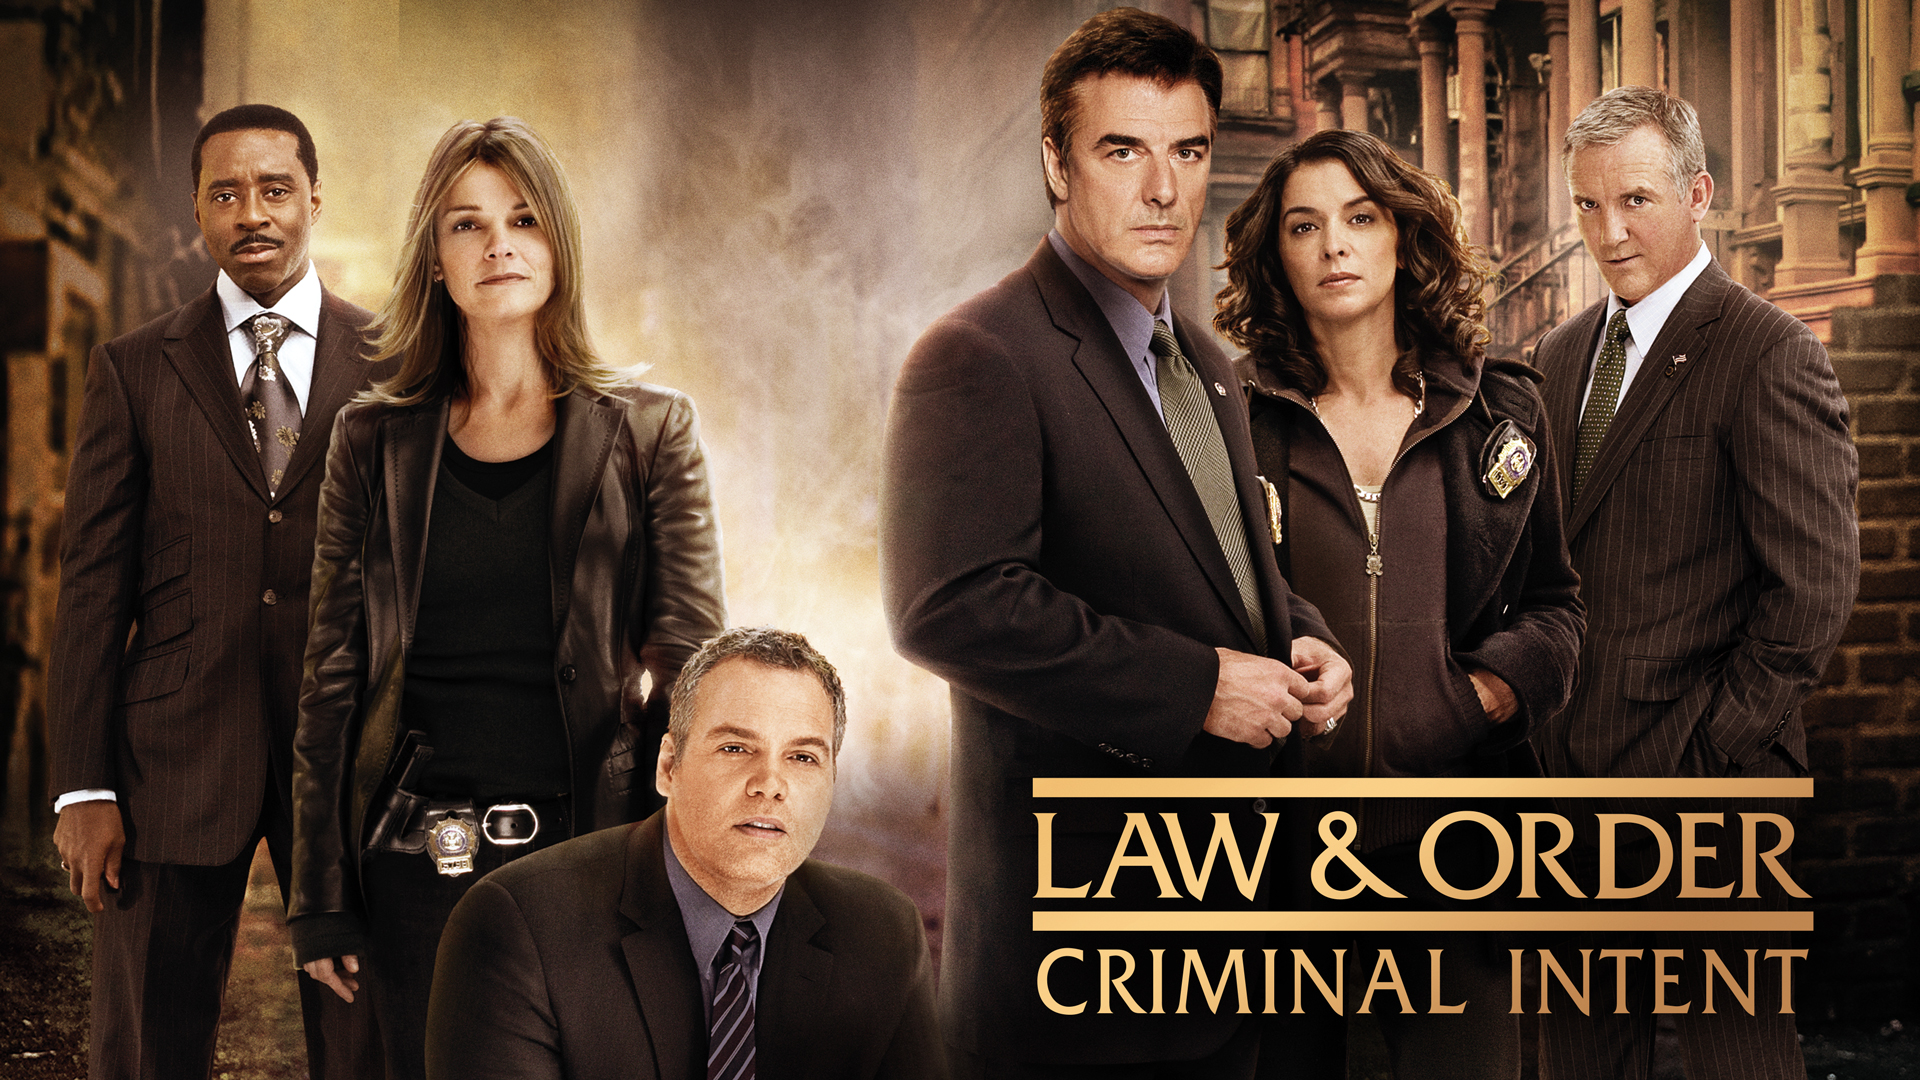 Watch Law Amp Order Criminal Intent Episodes